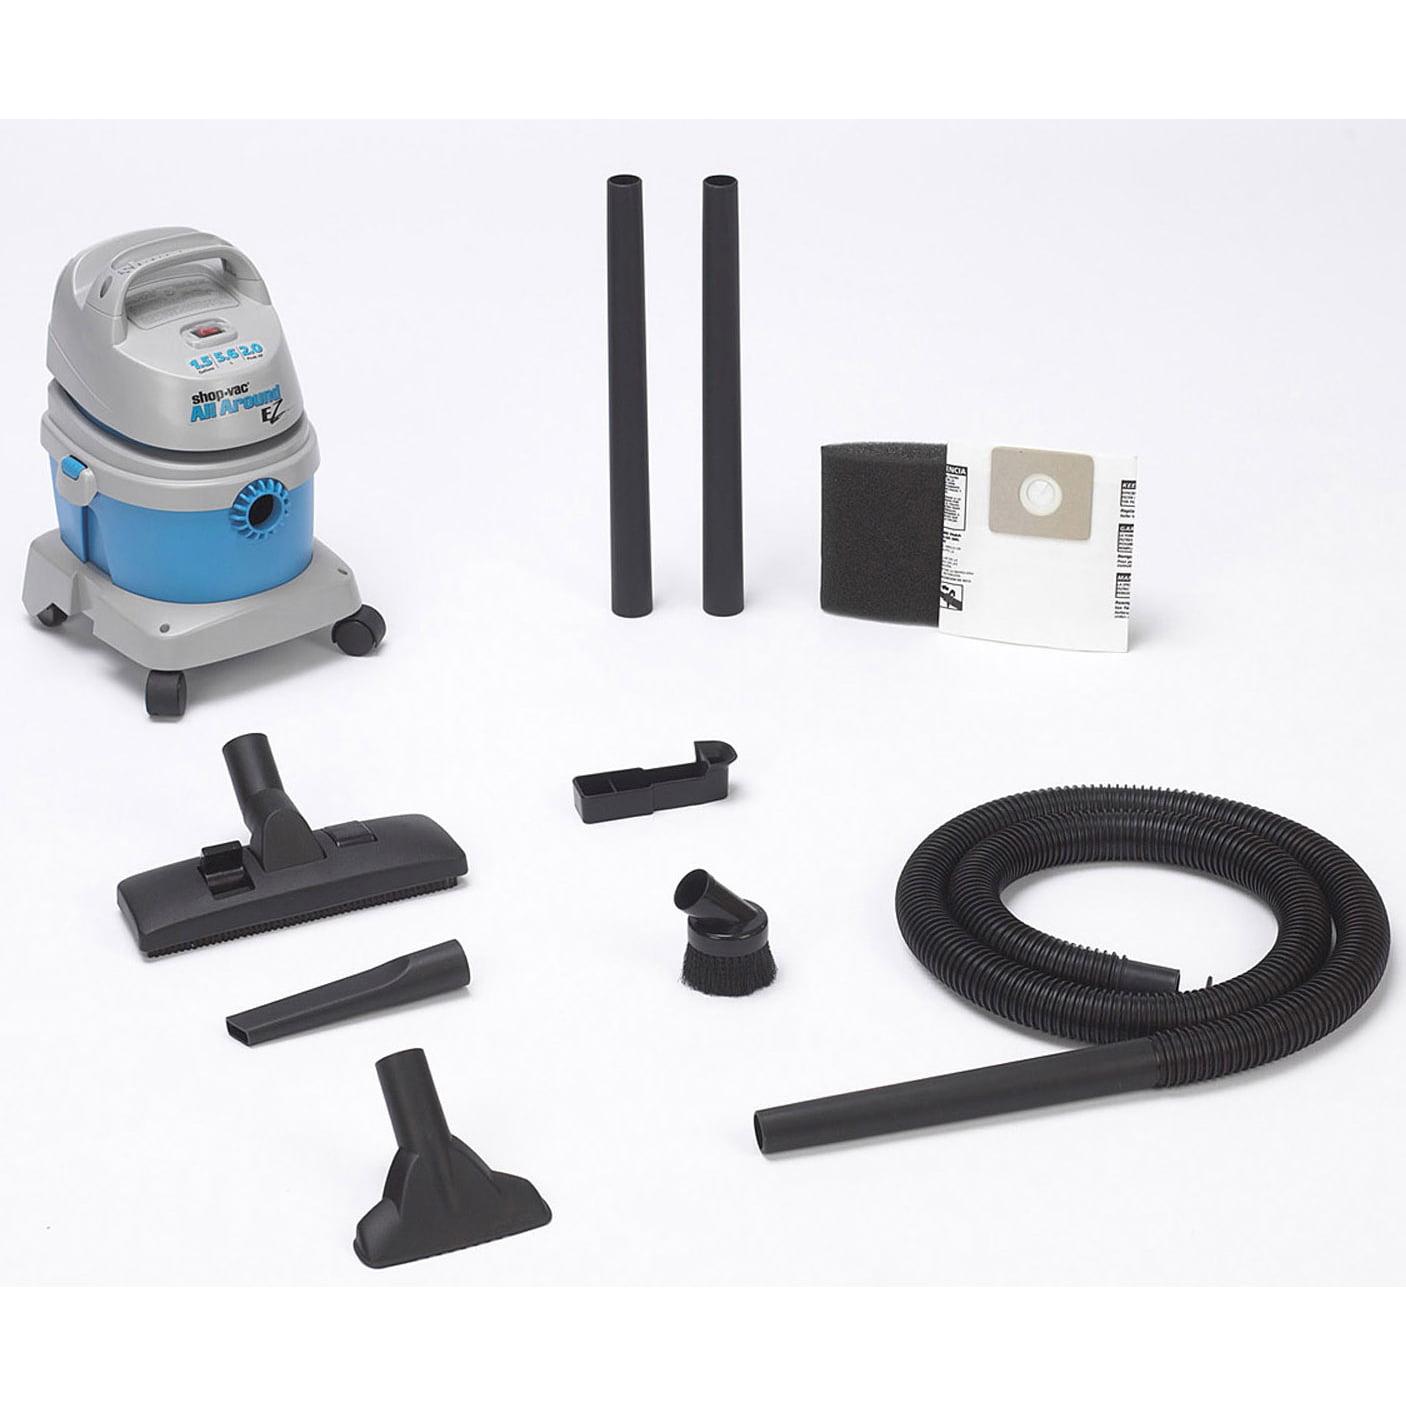 Shop Vac 589-51-00 1.5 Gallon 2 HP All Around EZ Wet & Dry Vac